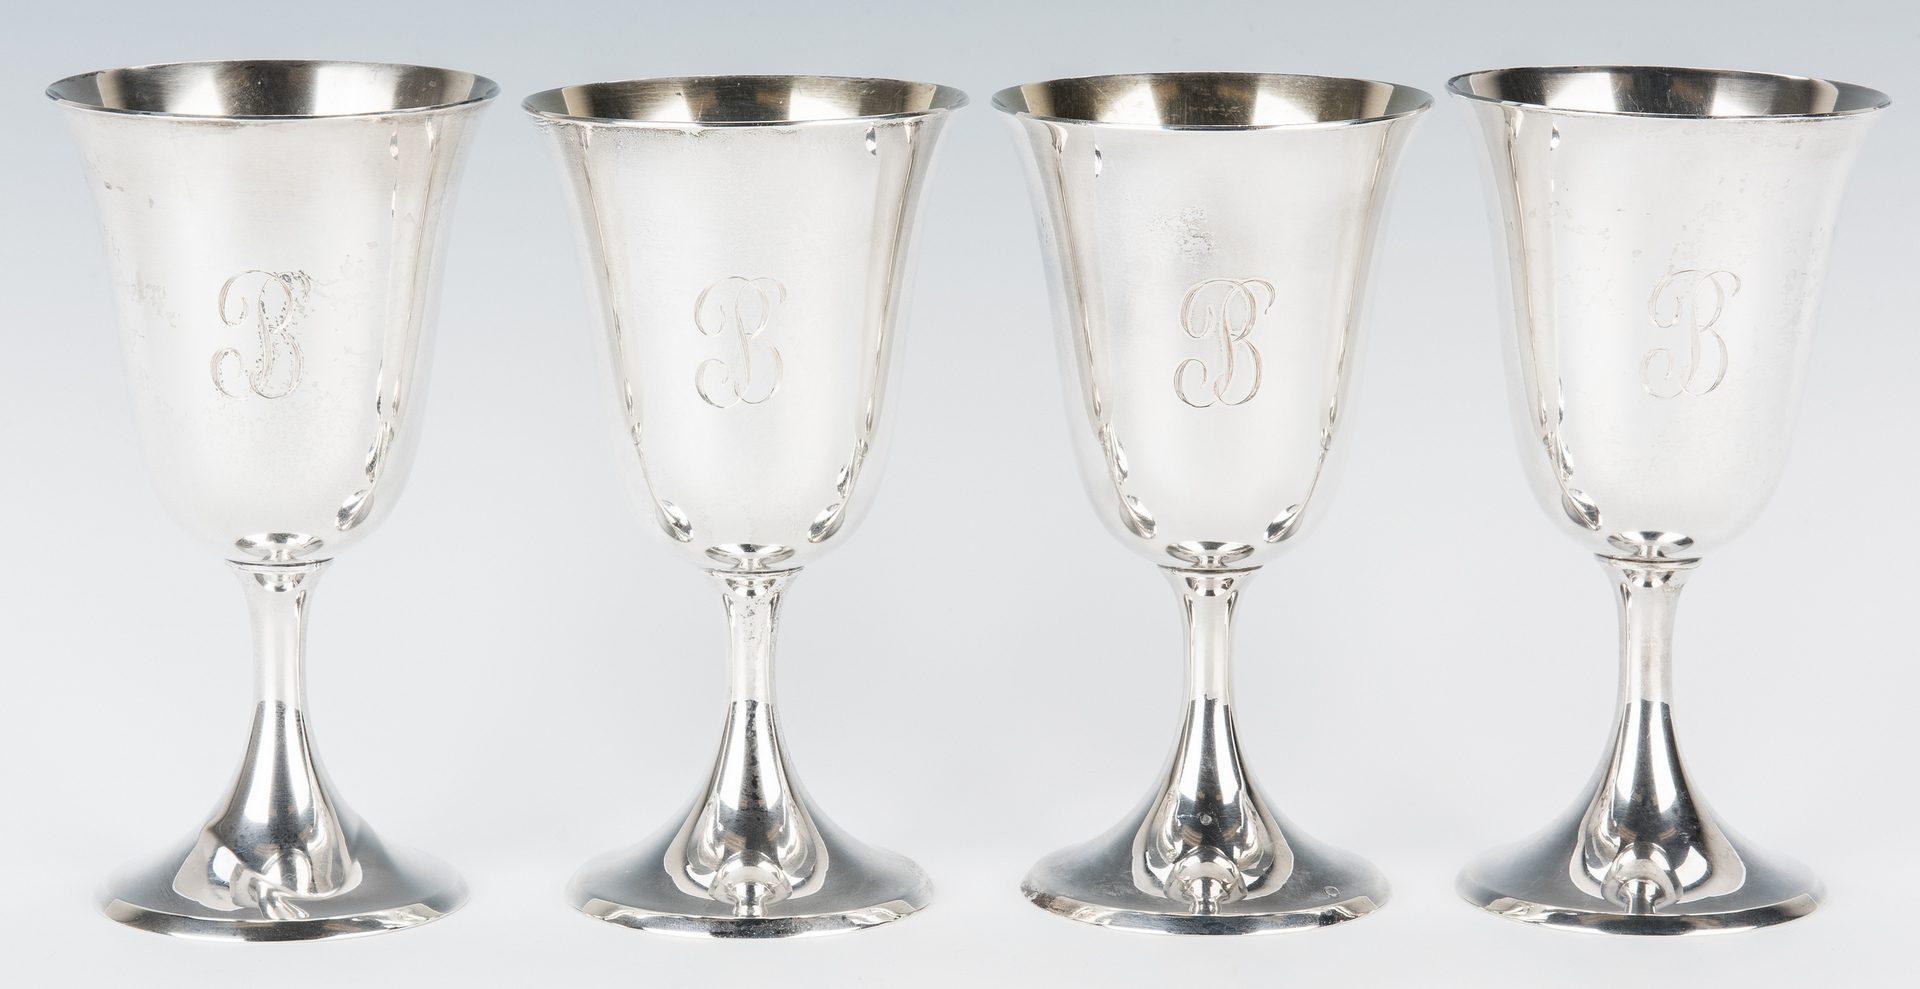 Lot 455: 8 Steiff Sterling Silver Water Goblets